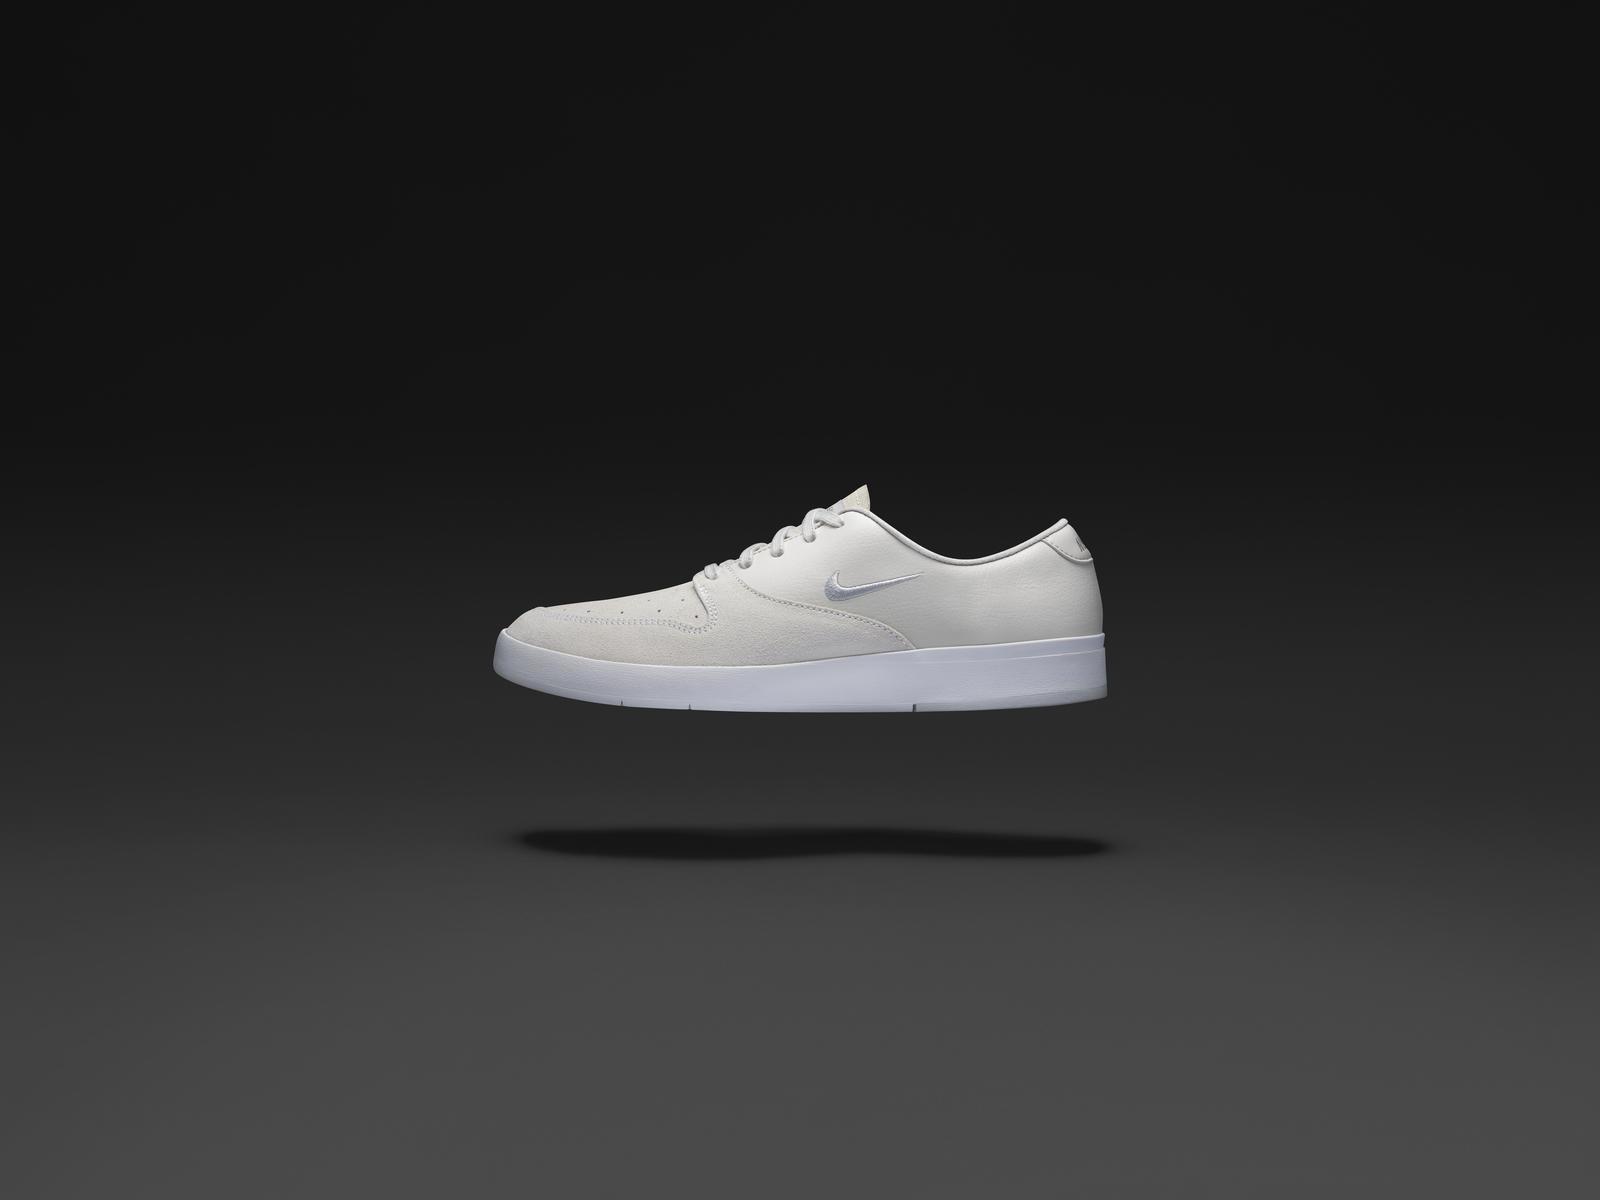 Nike News Sb viert 10e Paul Signature Shoe Rodriguez zijn IFCqIx1w